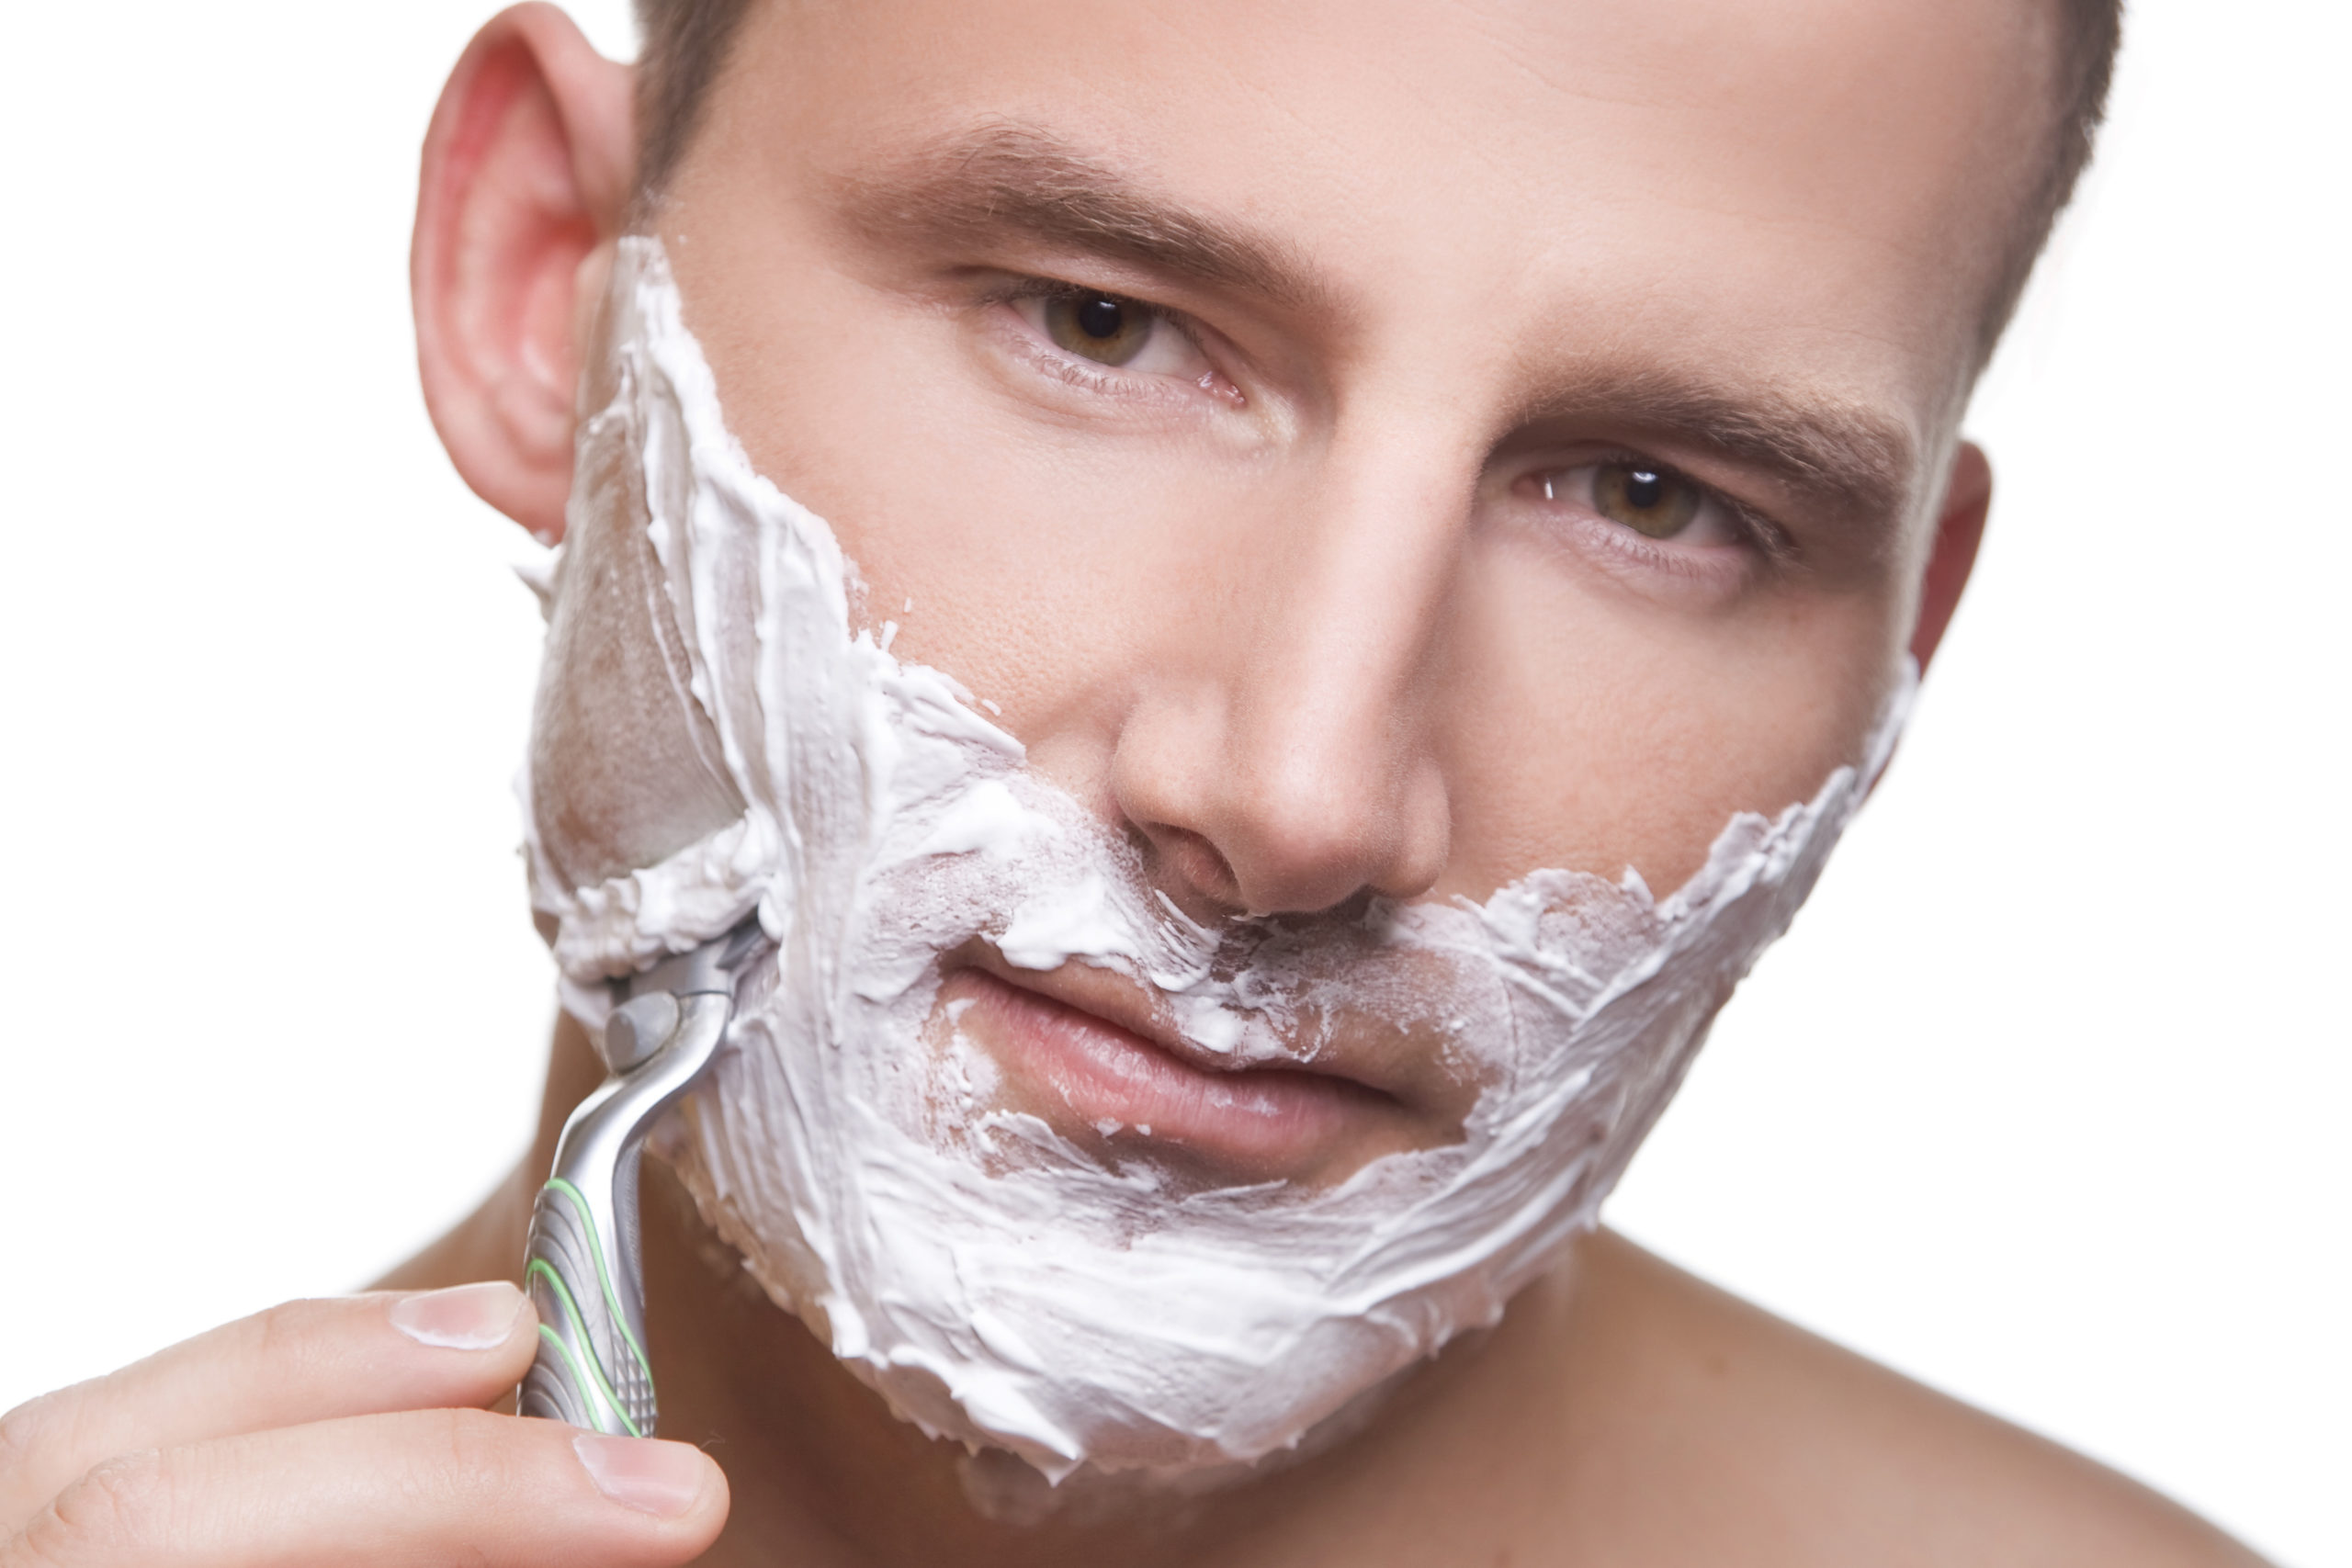 Taglia la barba